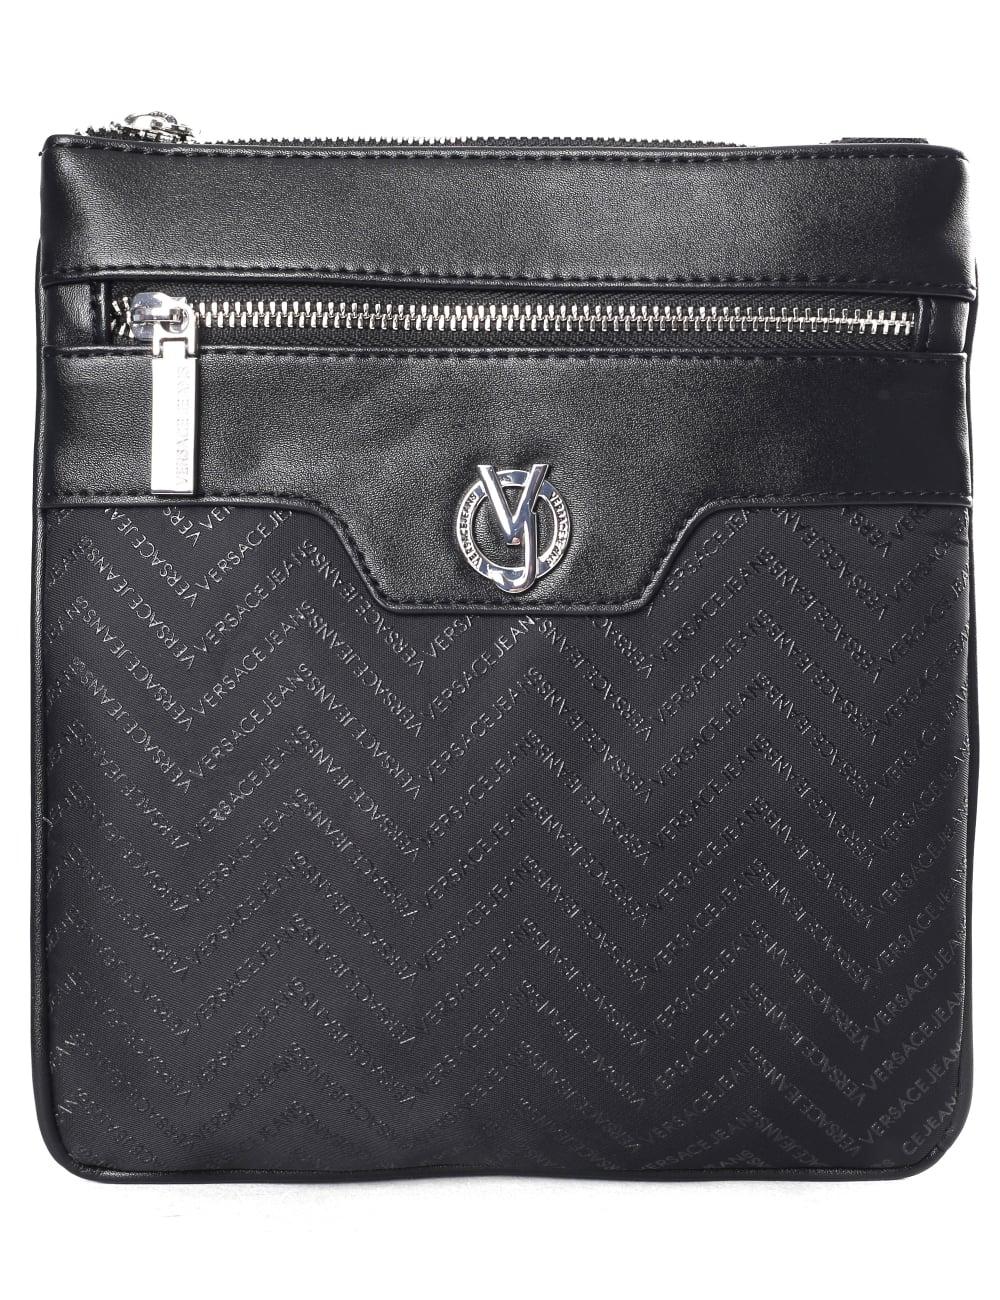 9ed31683 Versace Jeans Repeat Logo Men's Linea Messenger Bag